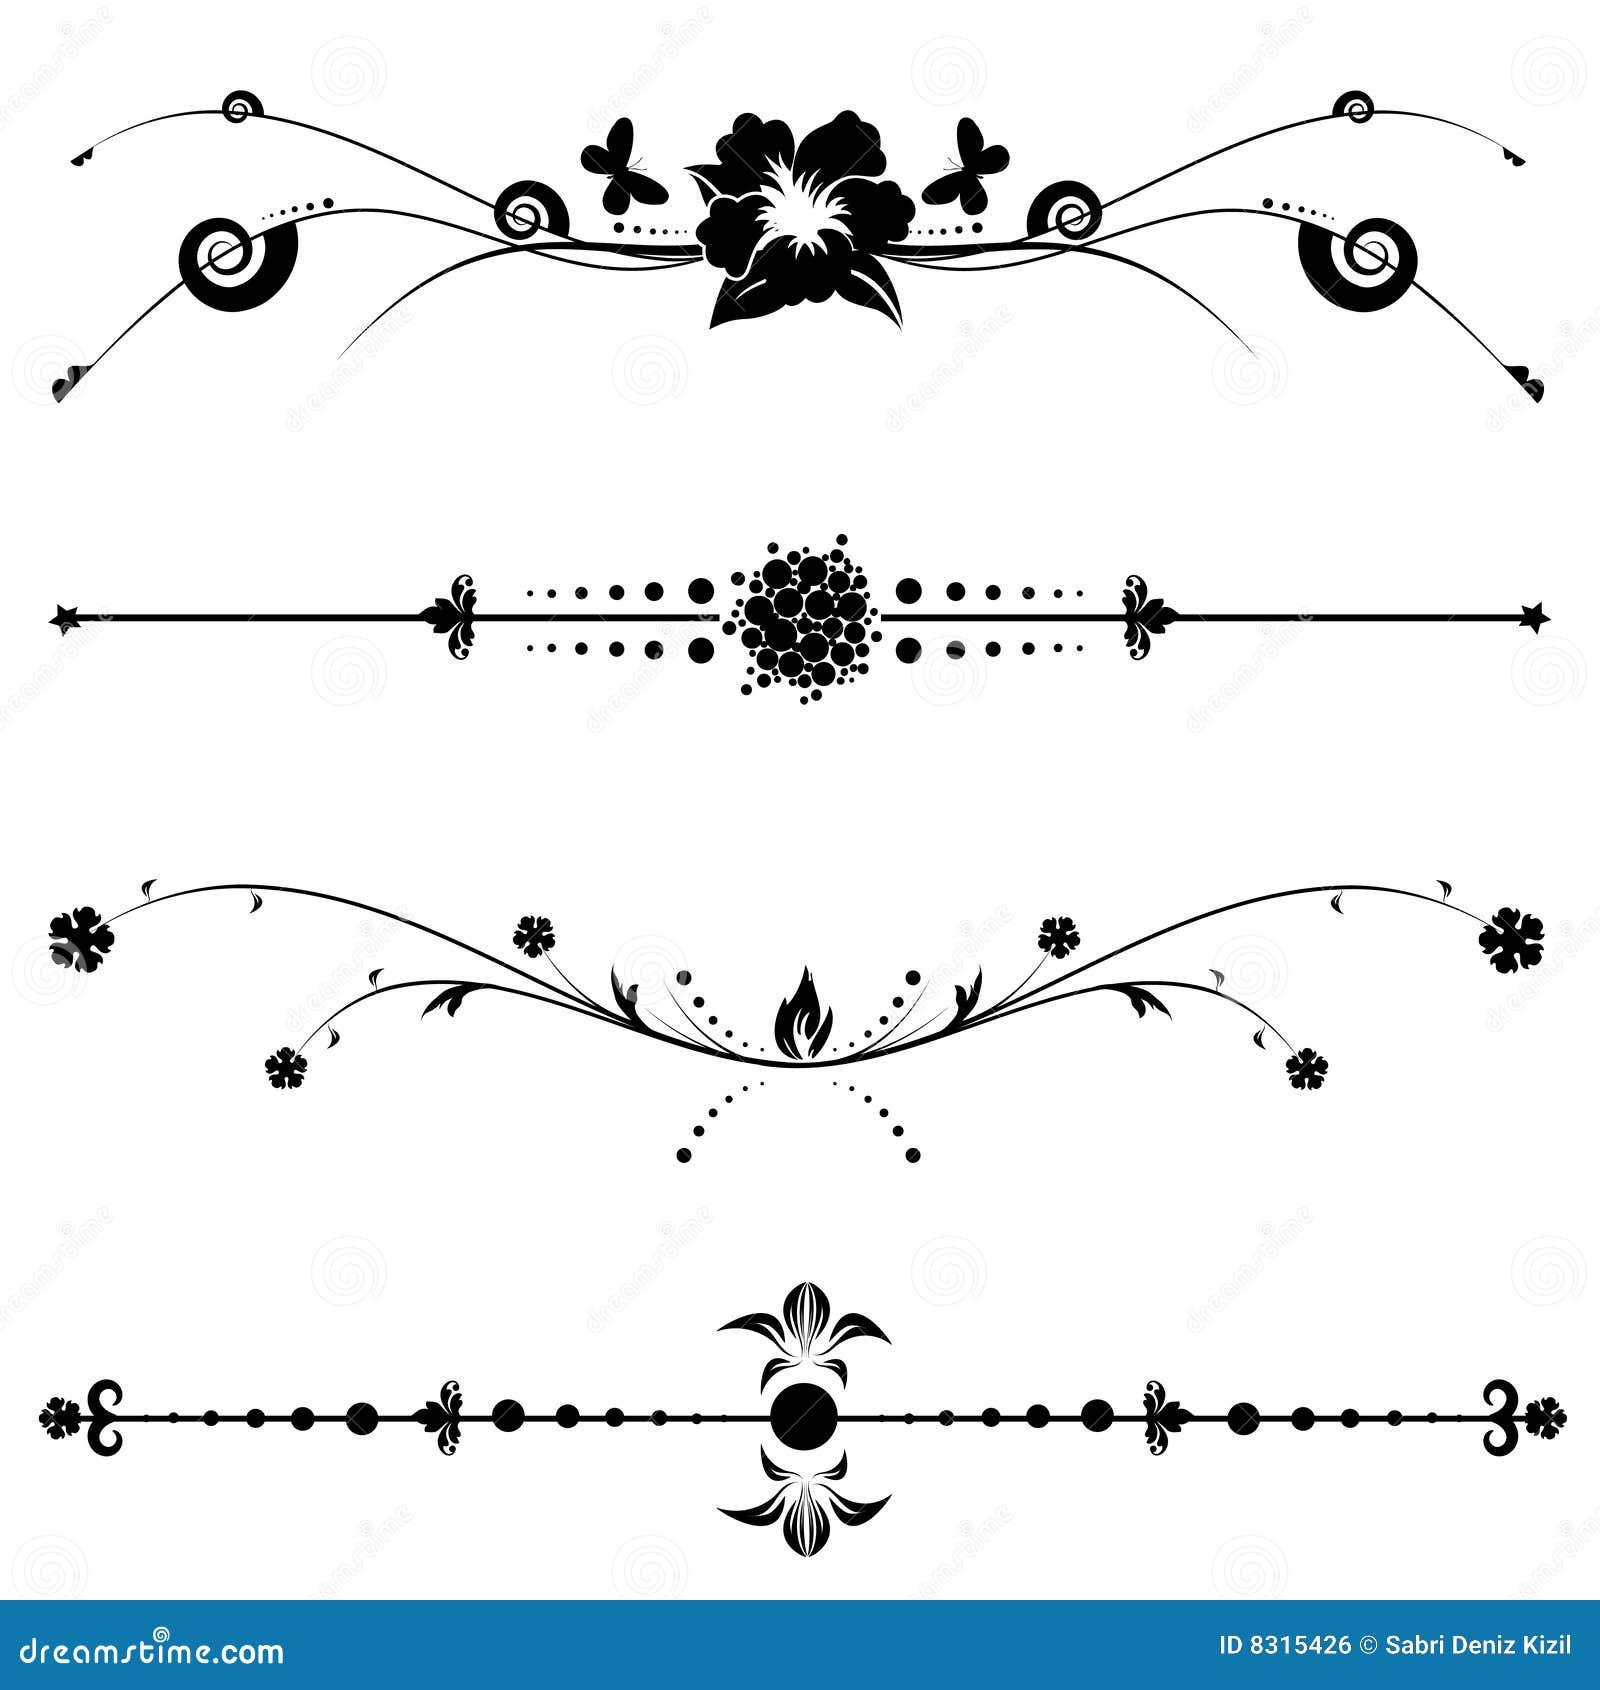 Vintage Decorative Designs Royalty Free Stock Image